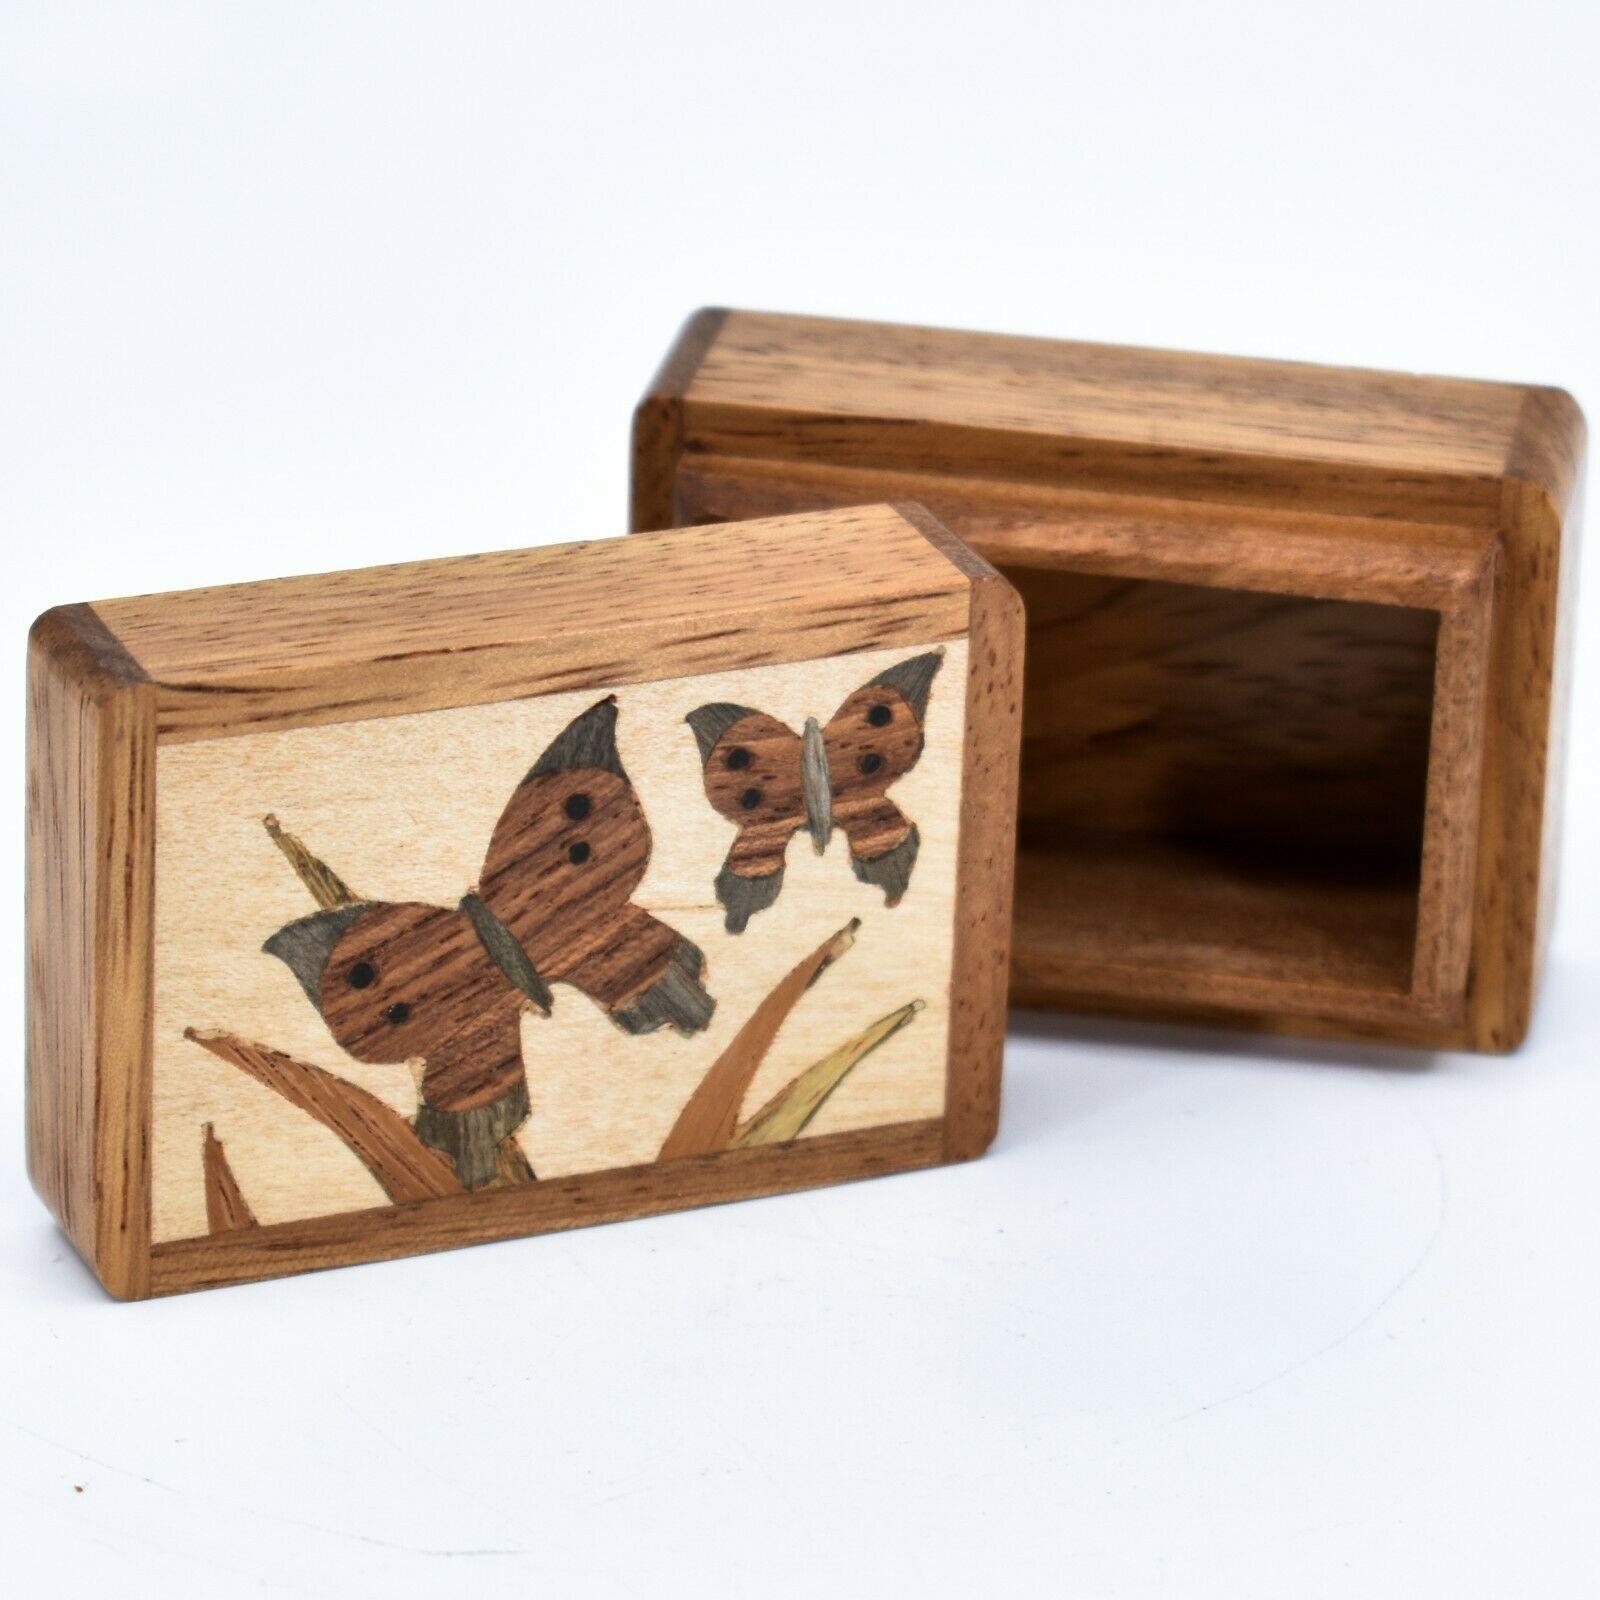 Northwoods Wooden Parquetry Country Garden Butterflies Mini Trinket Box